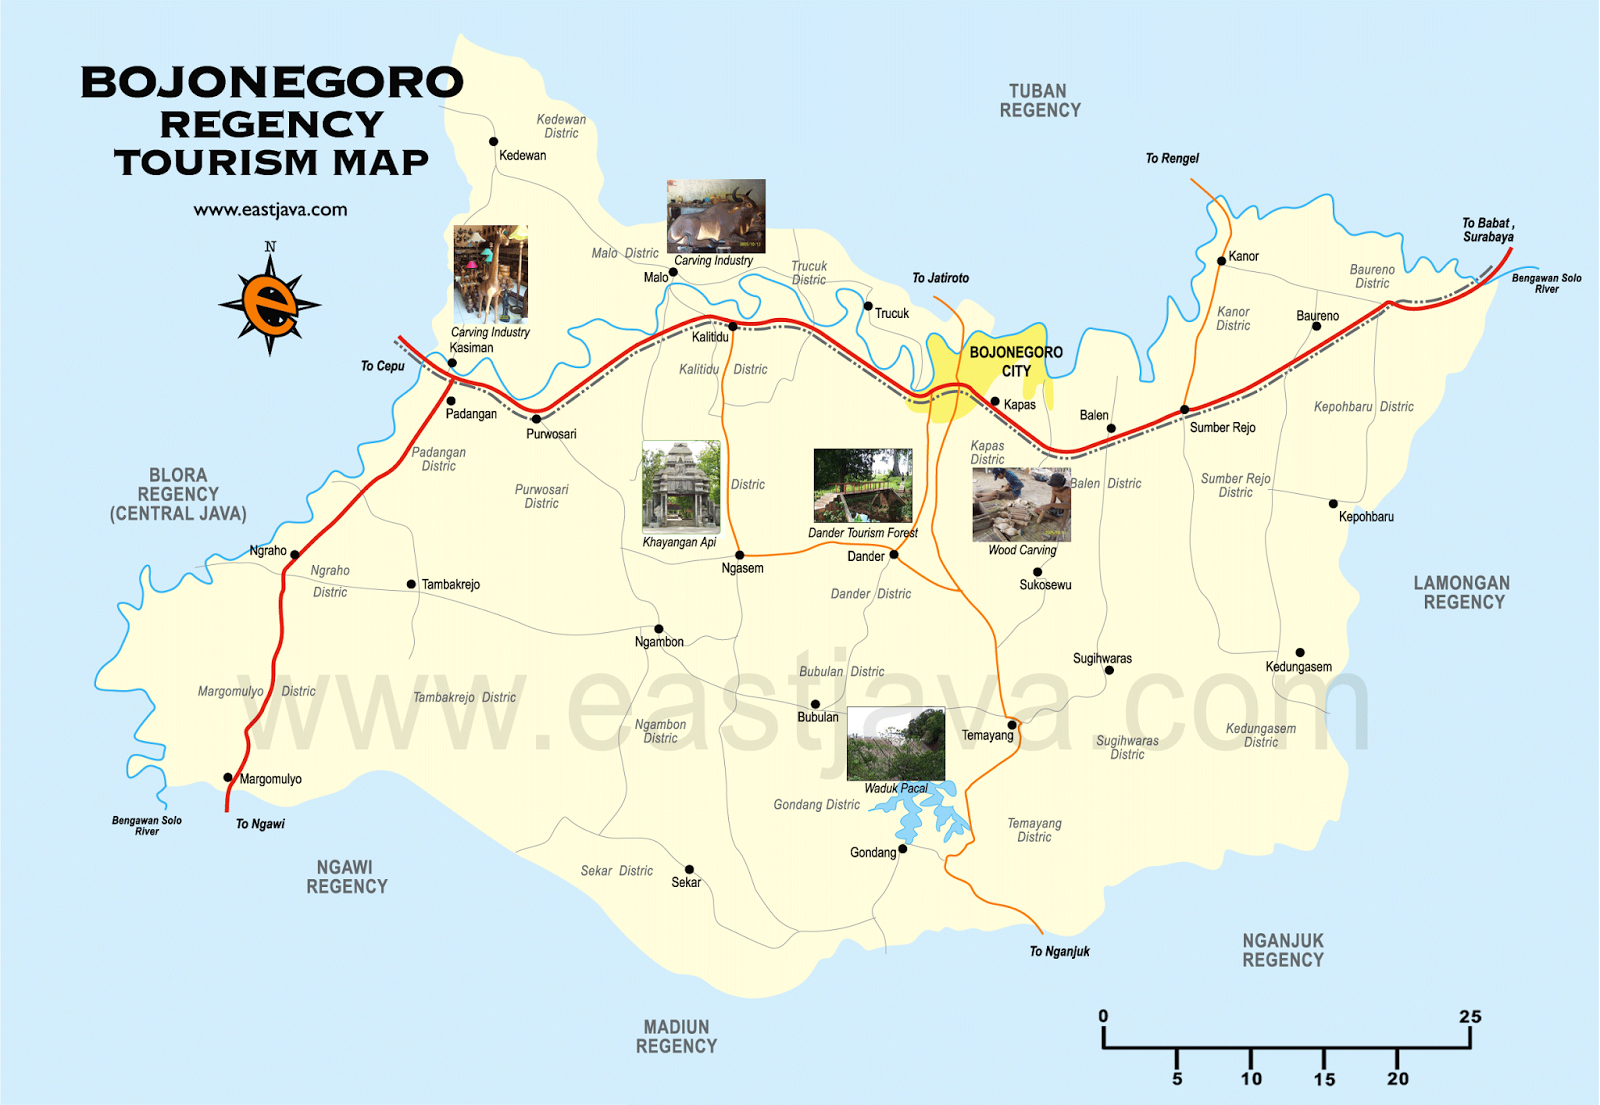 Objek Wisata Kecamatan Kapas Kabupaten Bojonegoro Jim Wacana Pengembangan Potensi